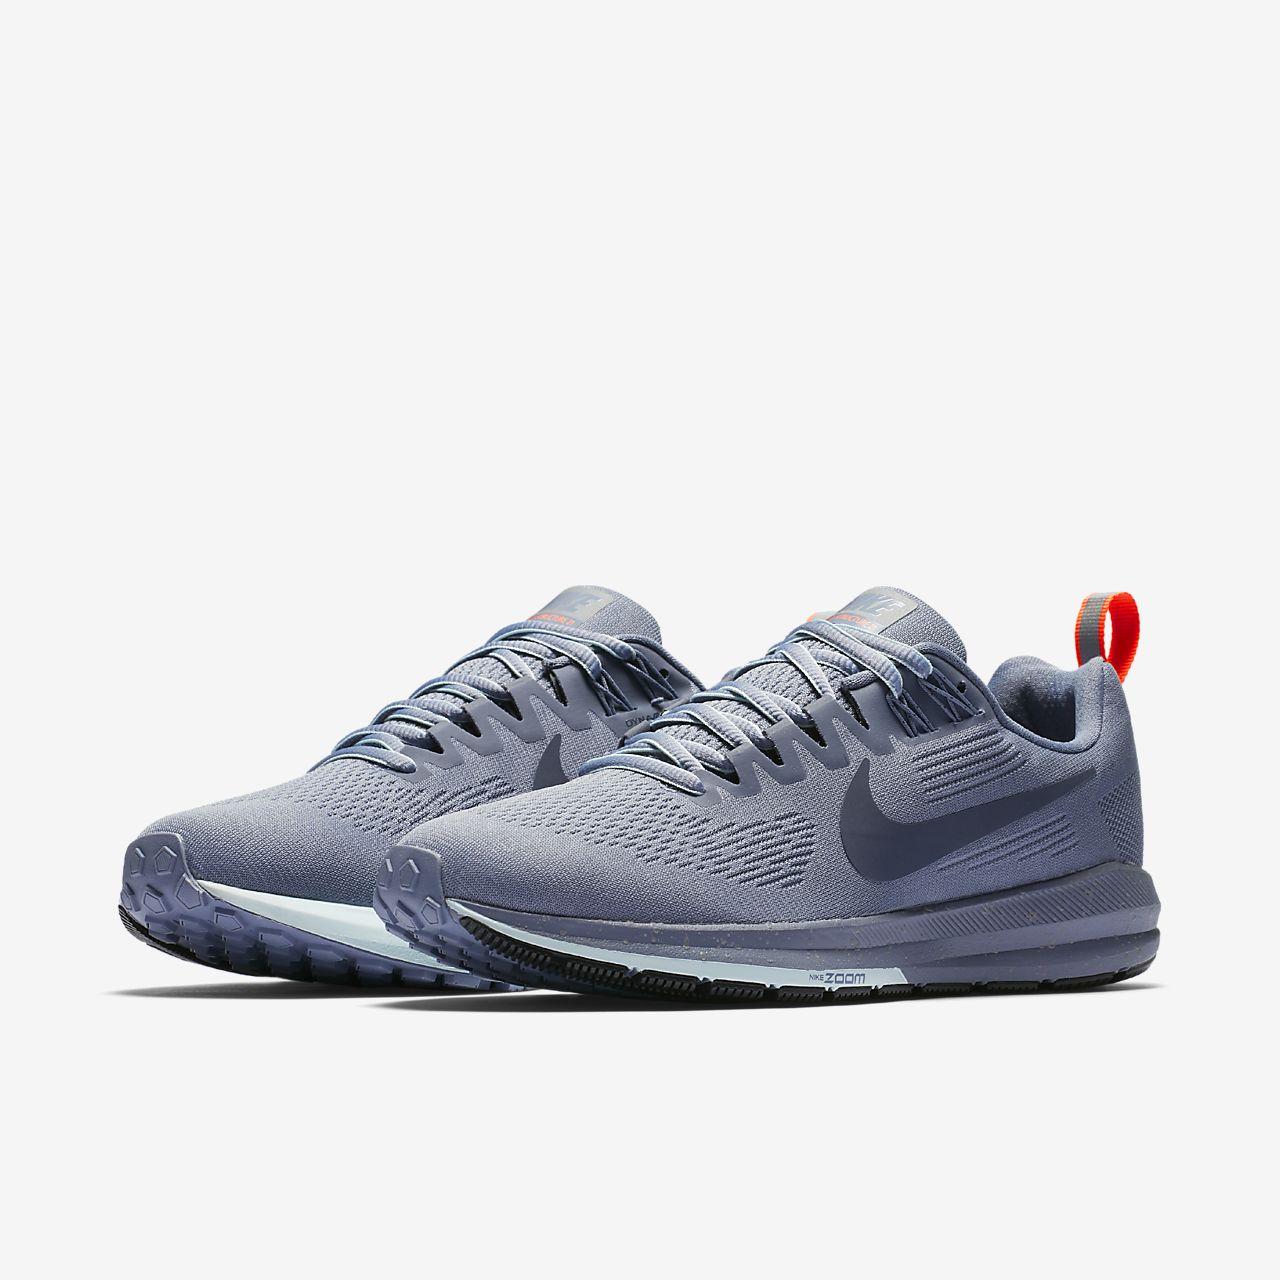 ... Nike Air Zoom Structure 21 Shield Women's Running Shoe